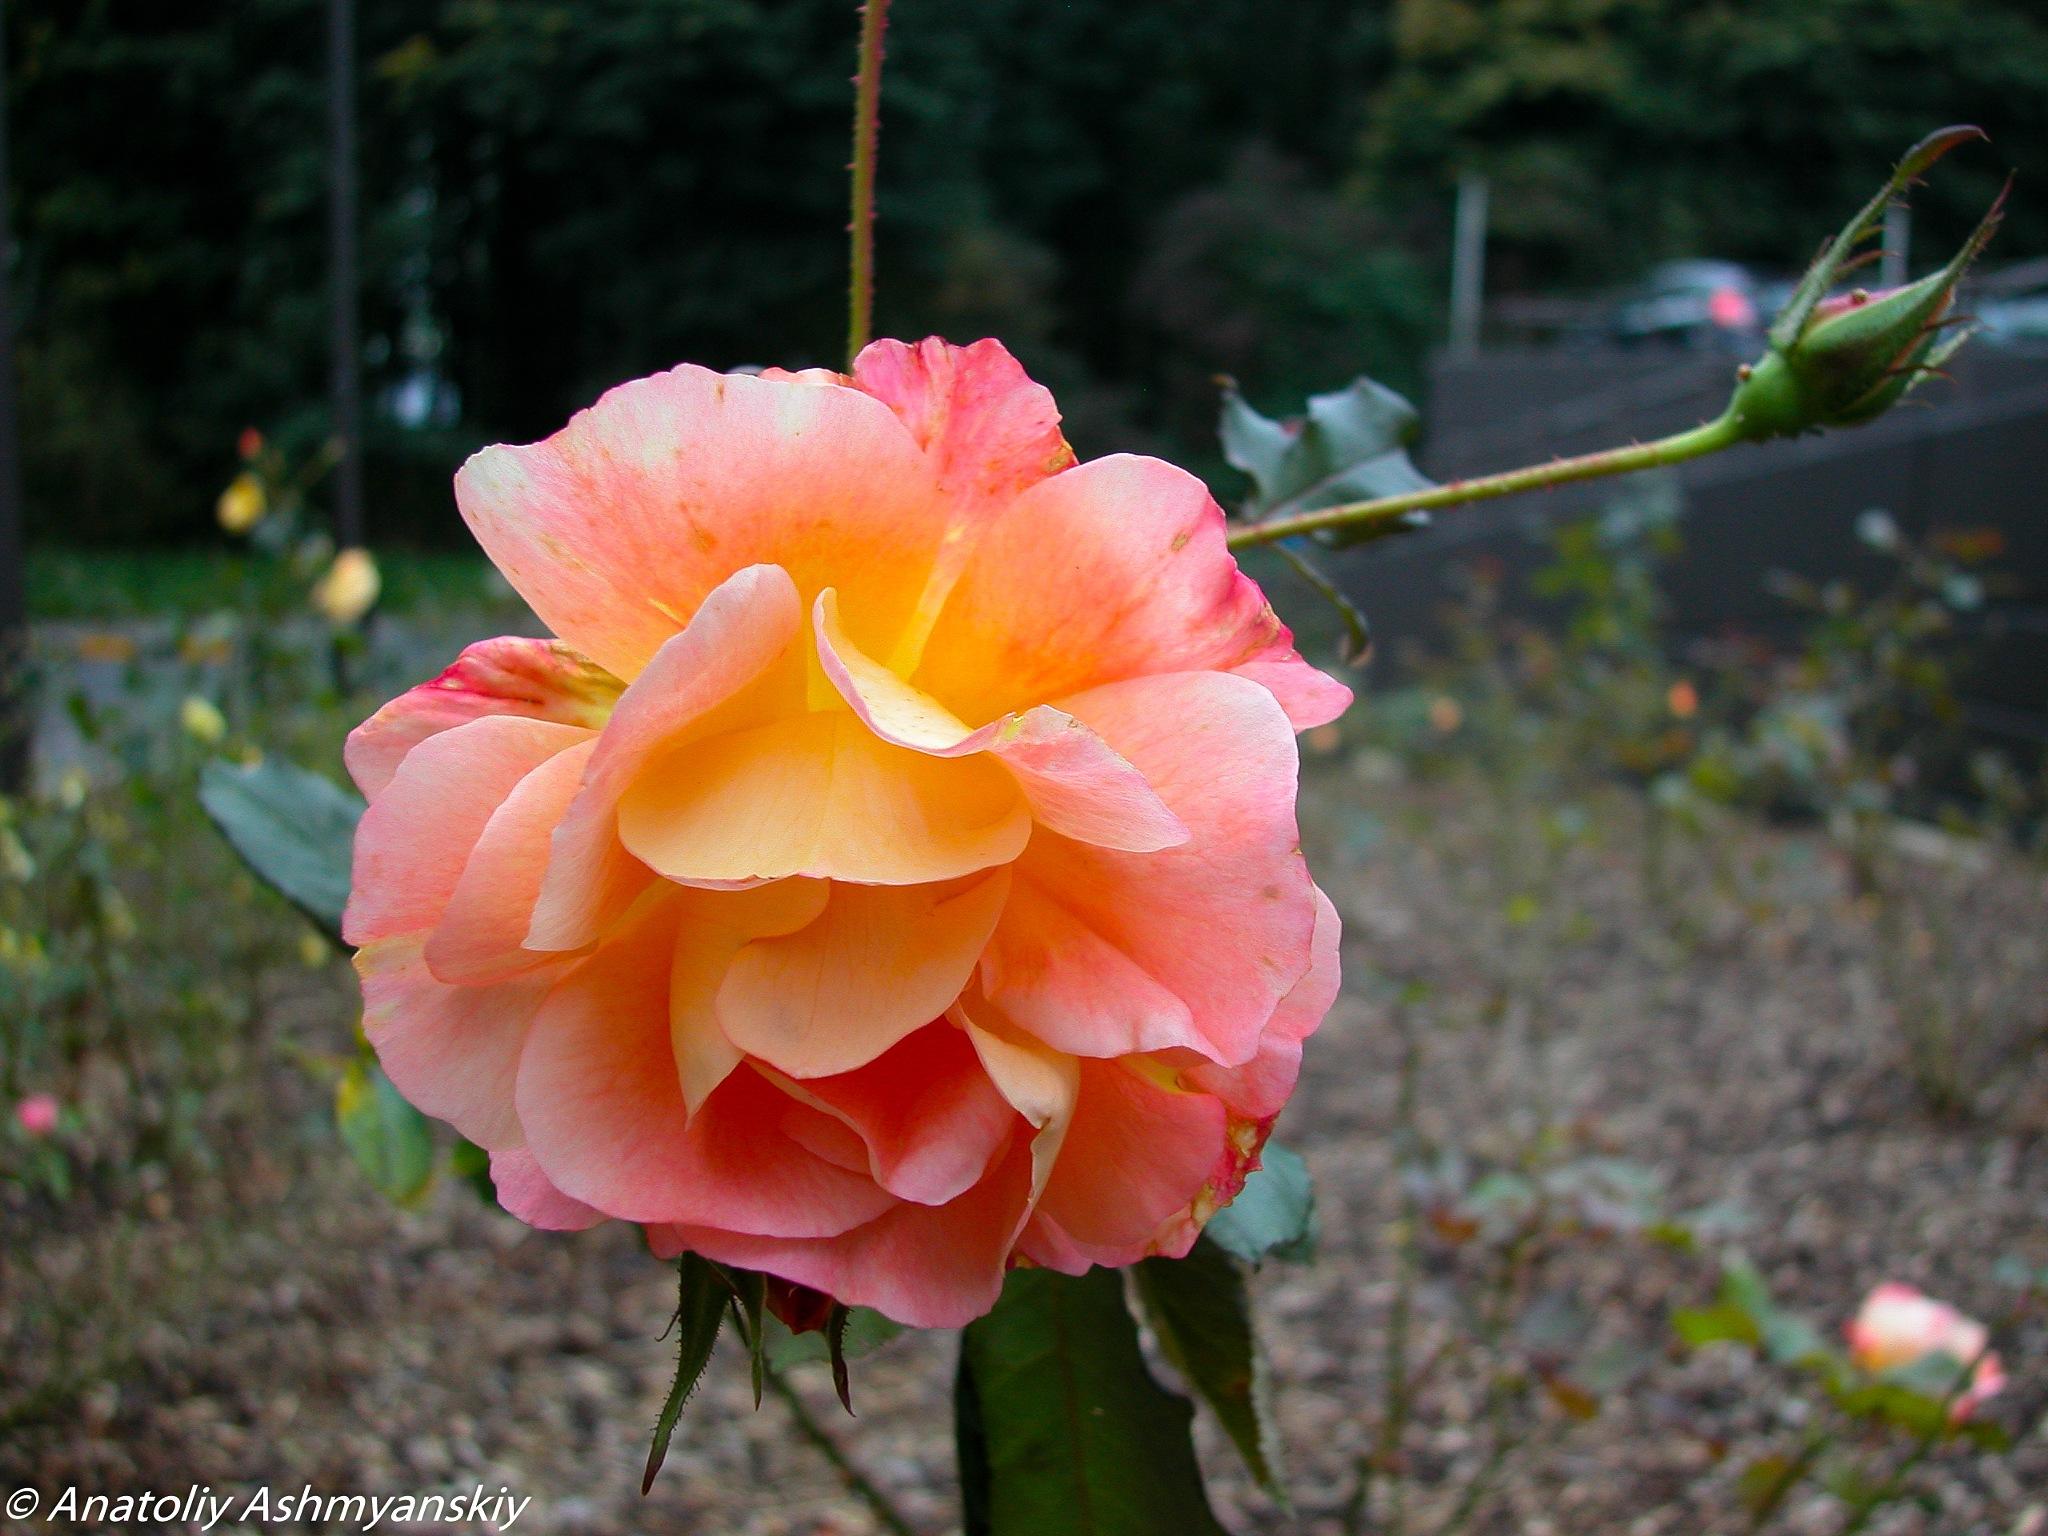 Shining rose by Anatoliy Ashmyanskiy